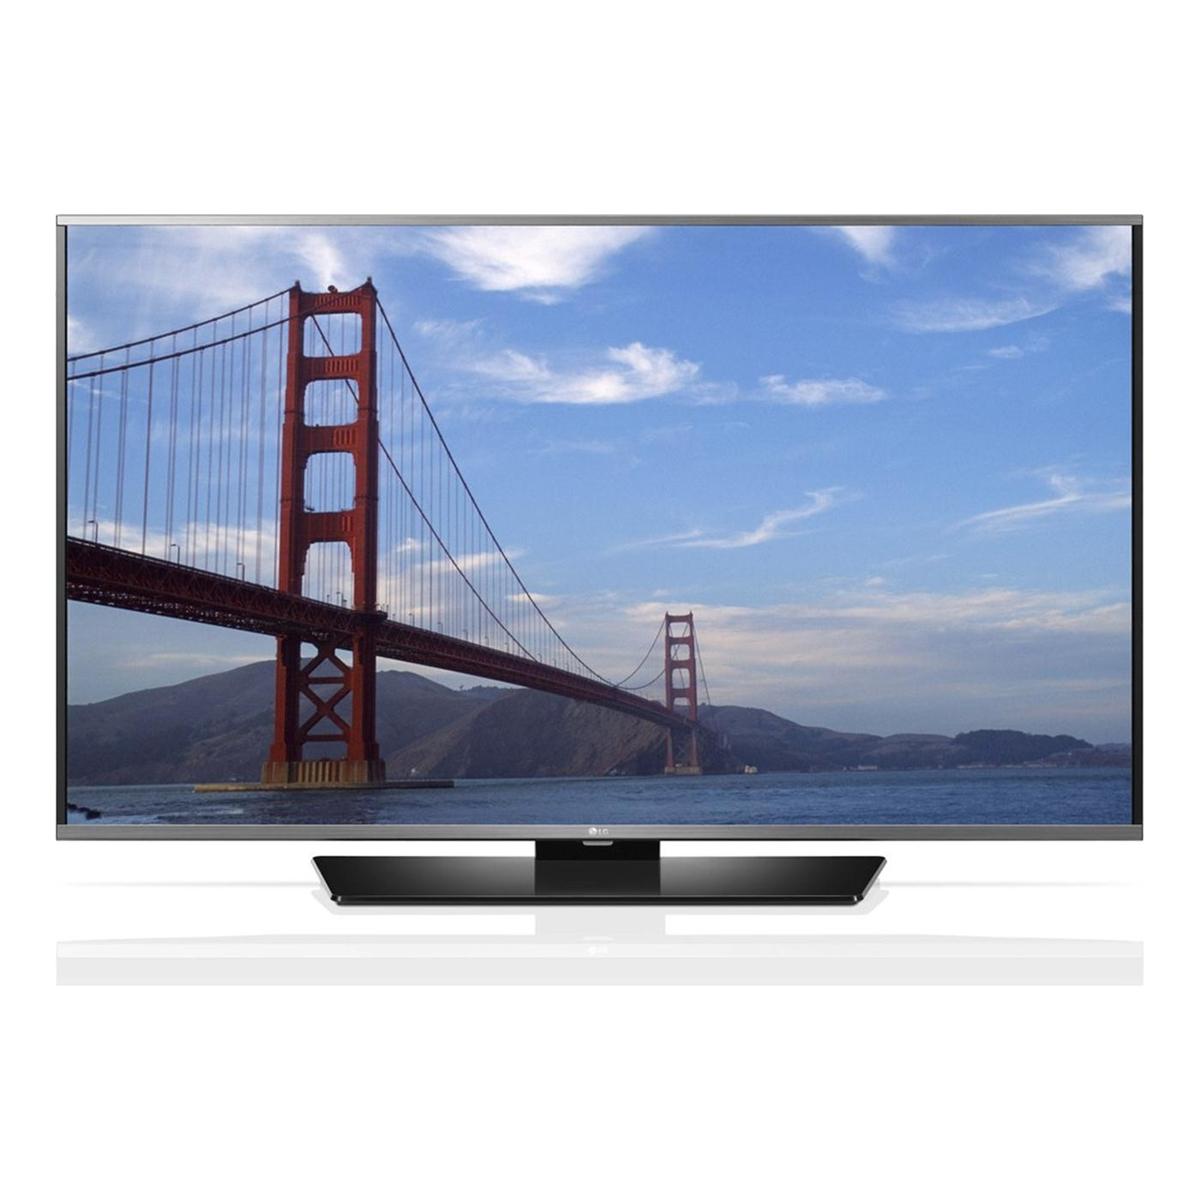 LG 65inch 6300 Series LED HDTV - 65LF6300